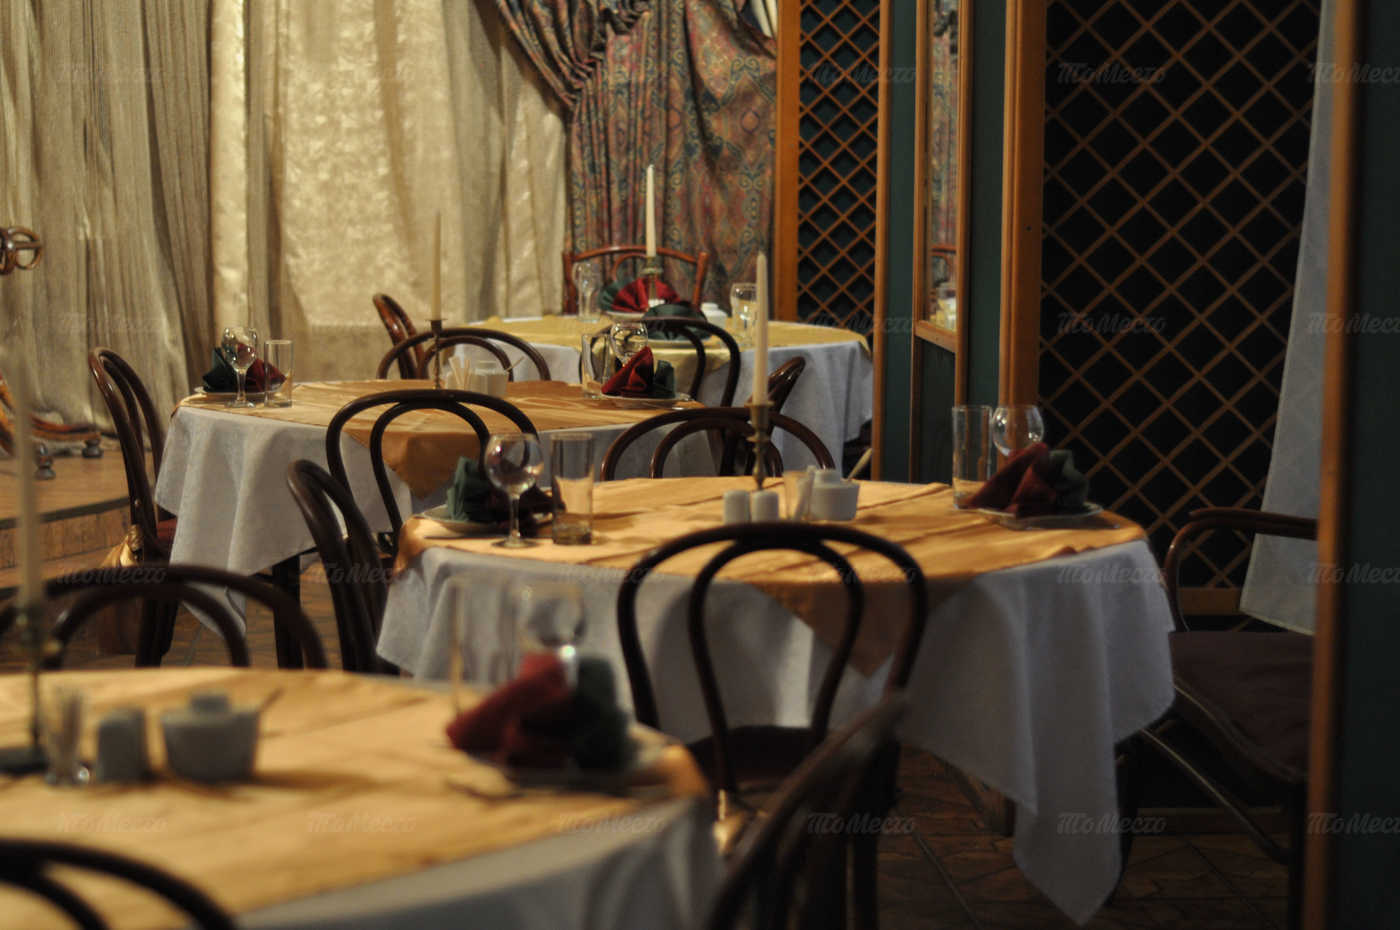 Меню ресторана Старая деревня на улице Савушкина